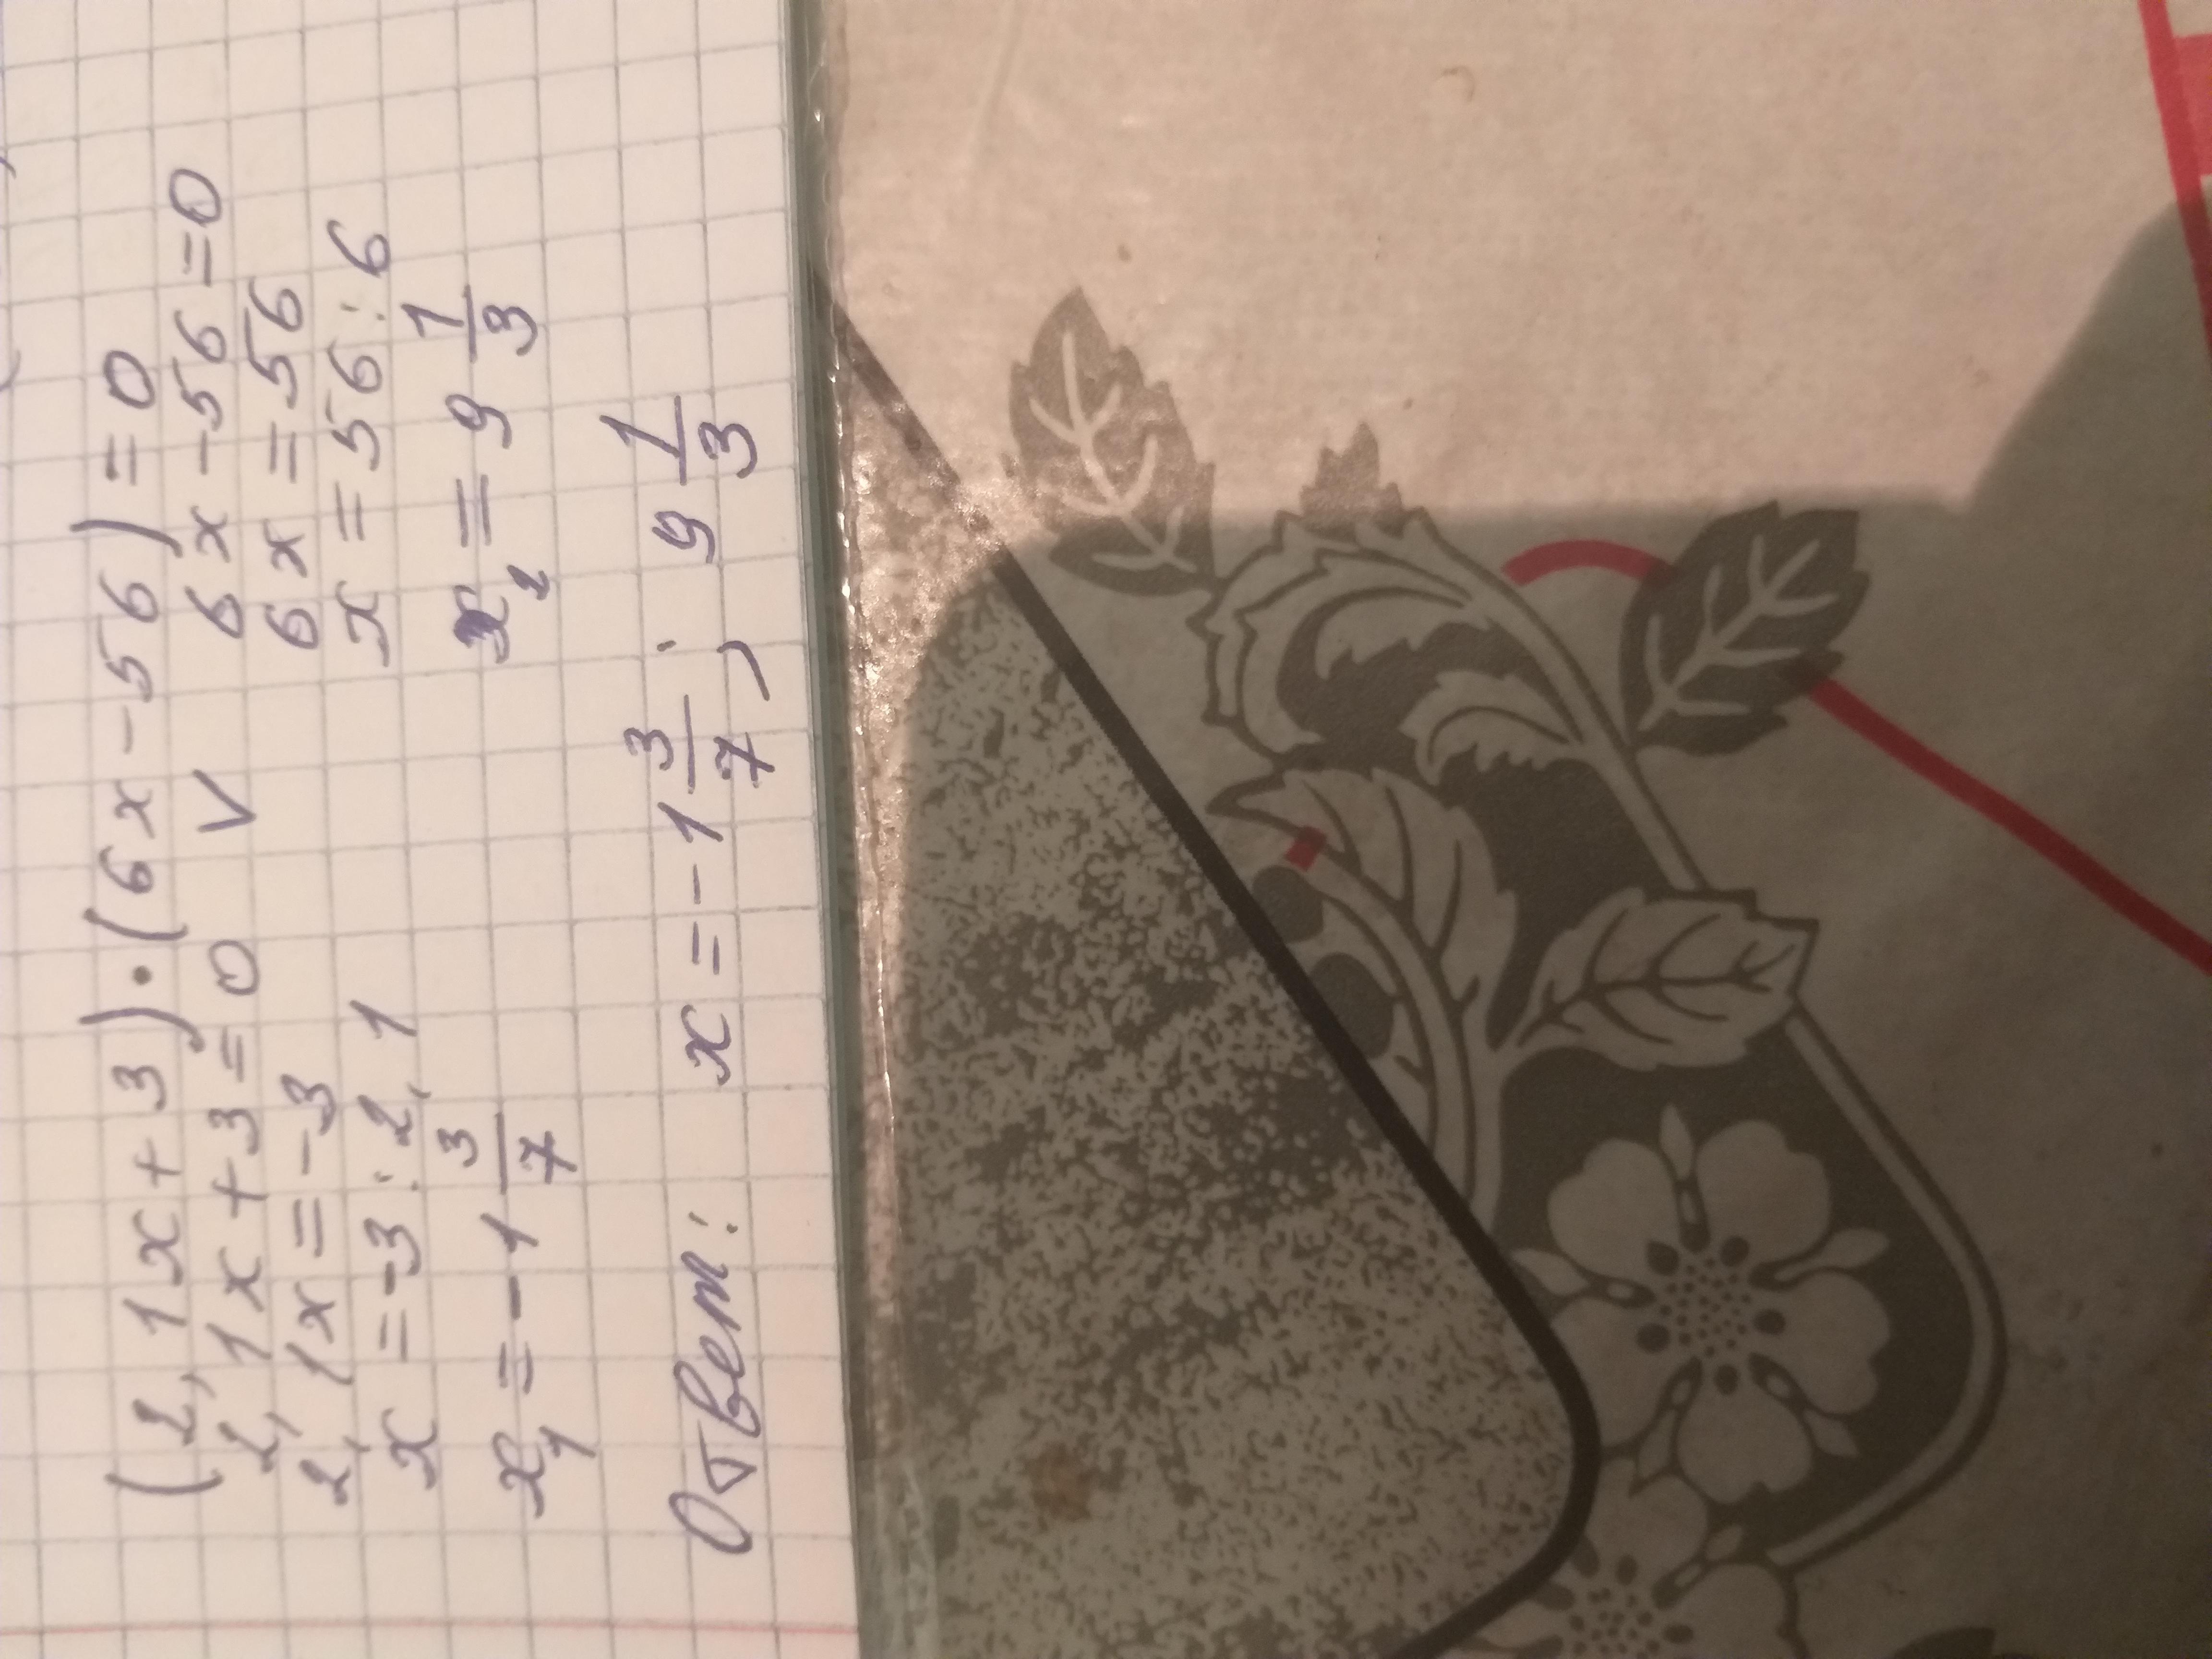 (2.1x+3) * ( 6x-56)=0